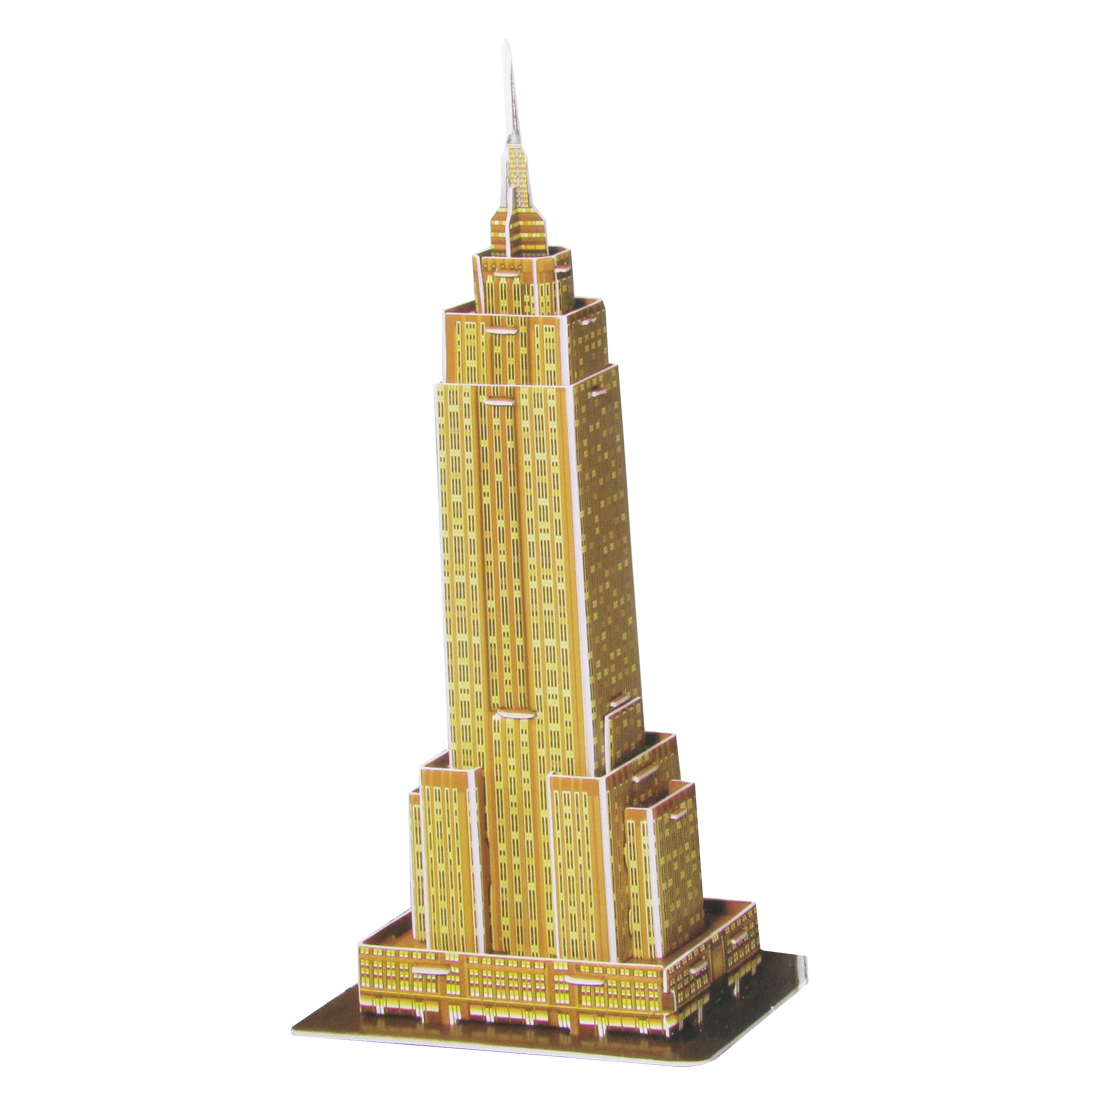 Mini Size World's Architecture Empire State Building 3D Jigsaw Puzzle